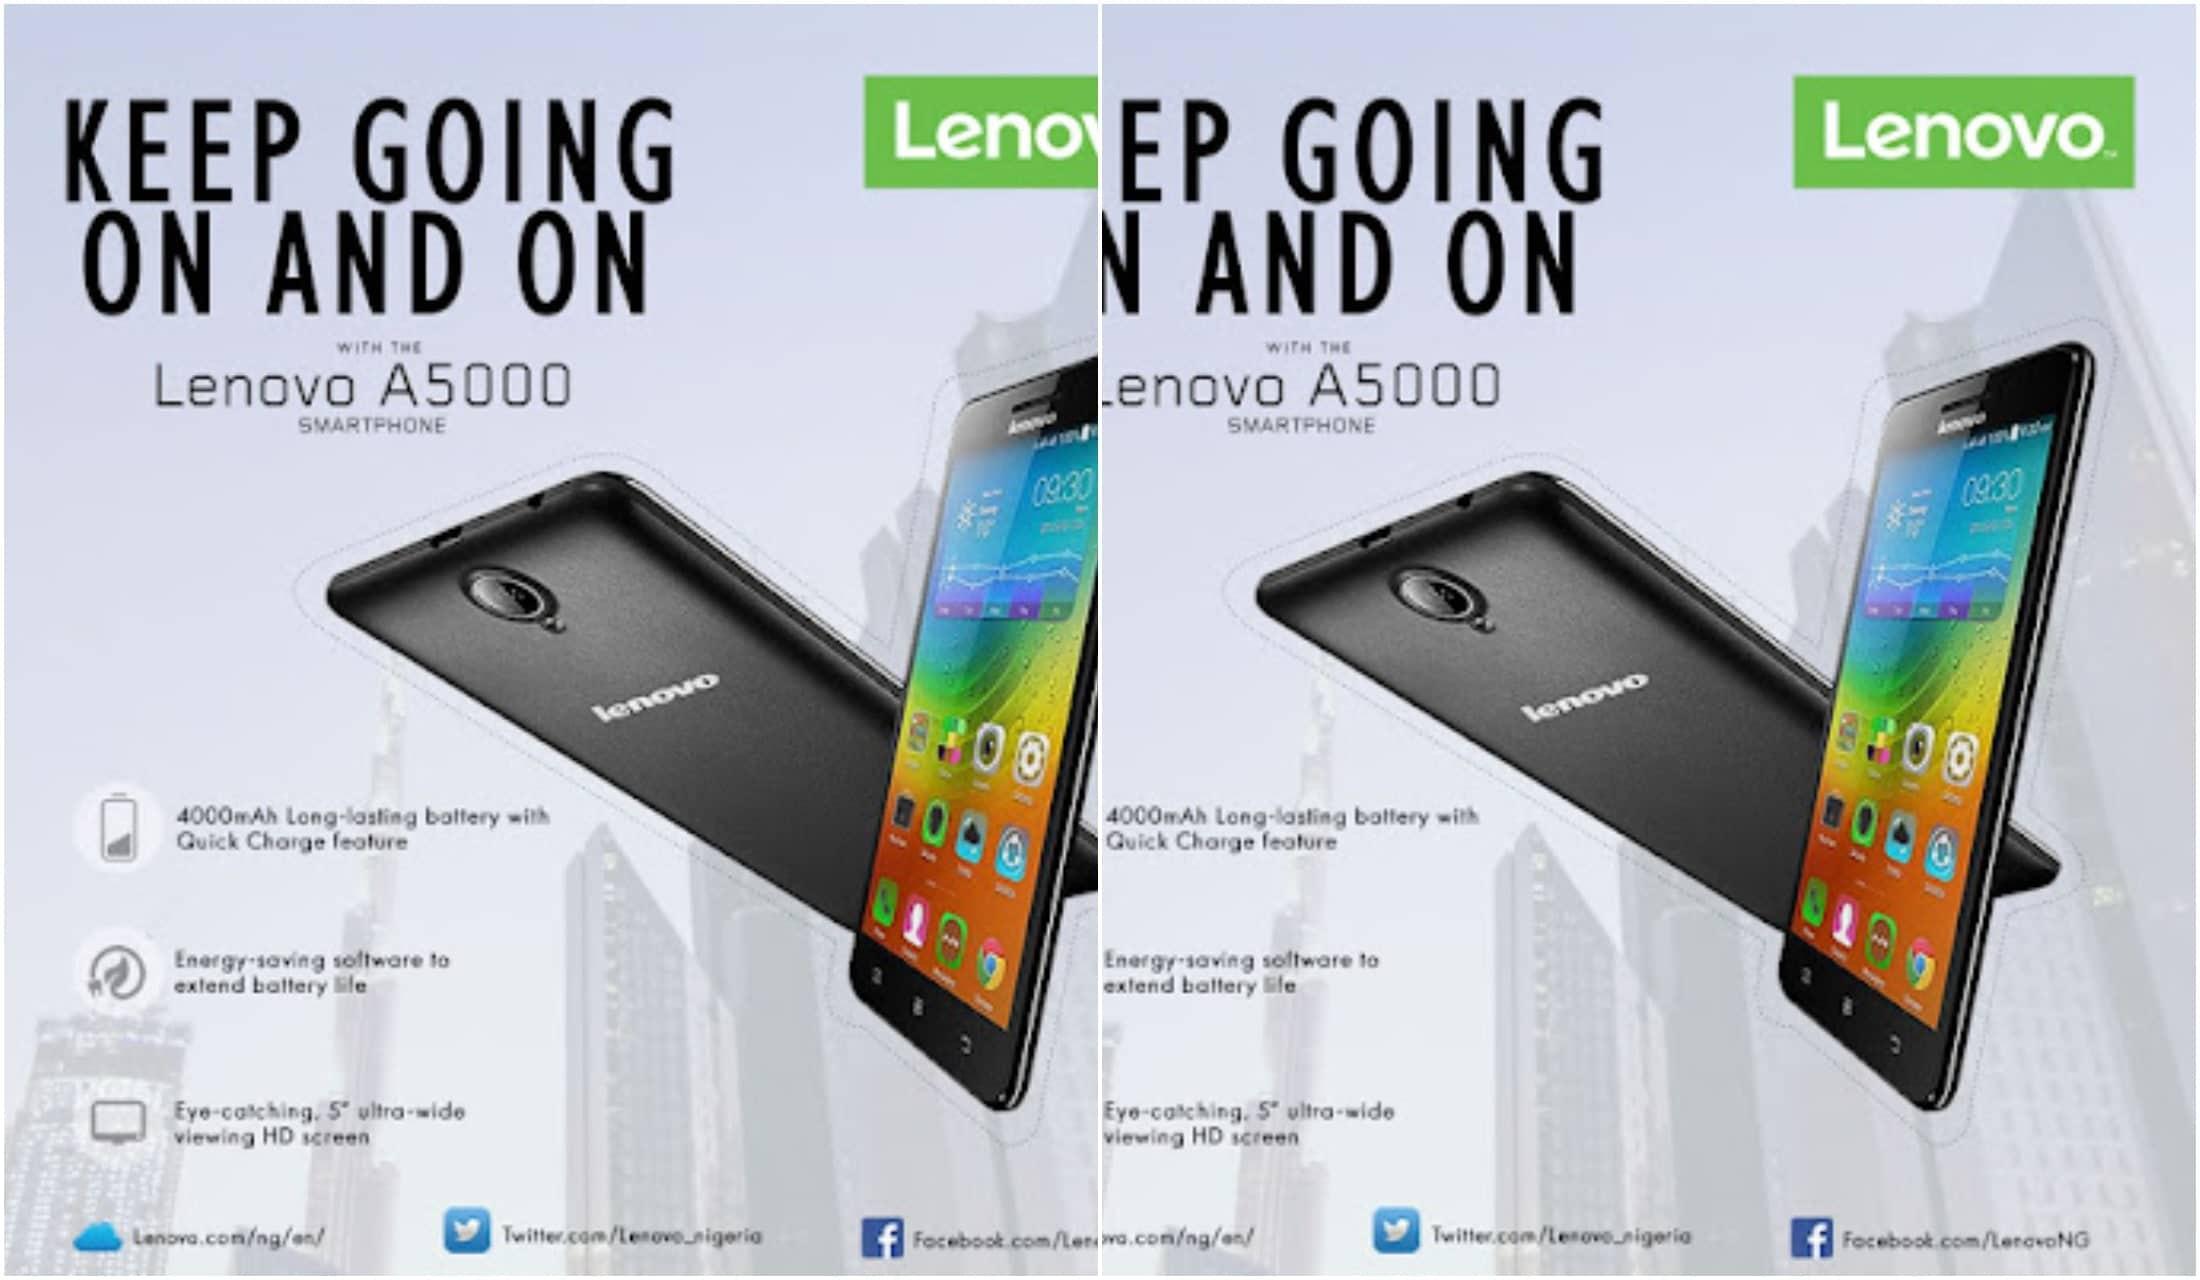 Lenovo announces new smartphones